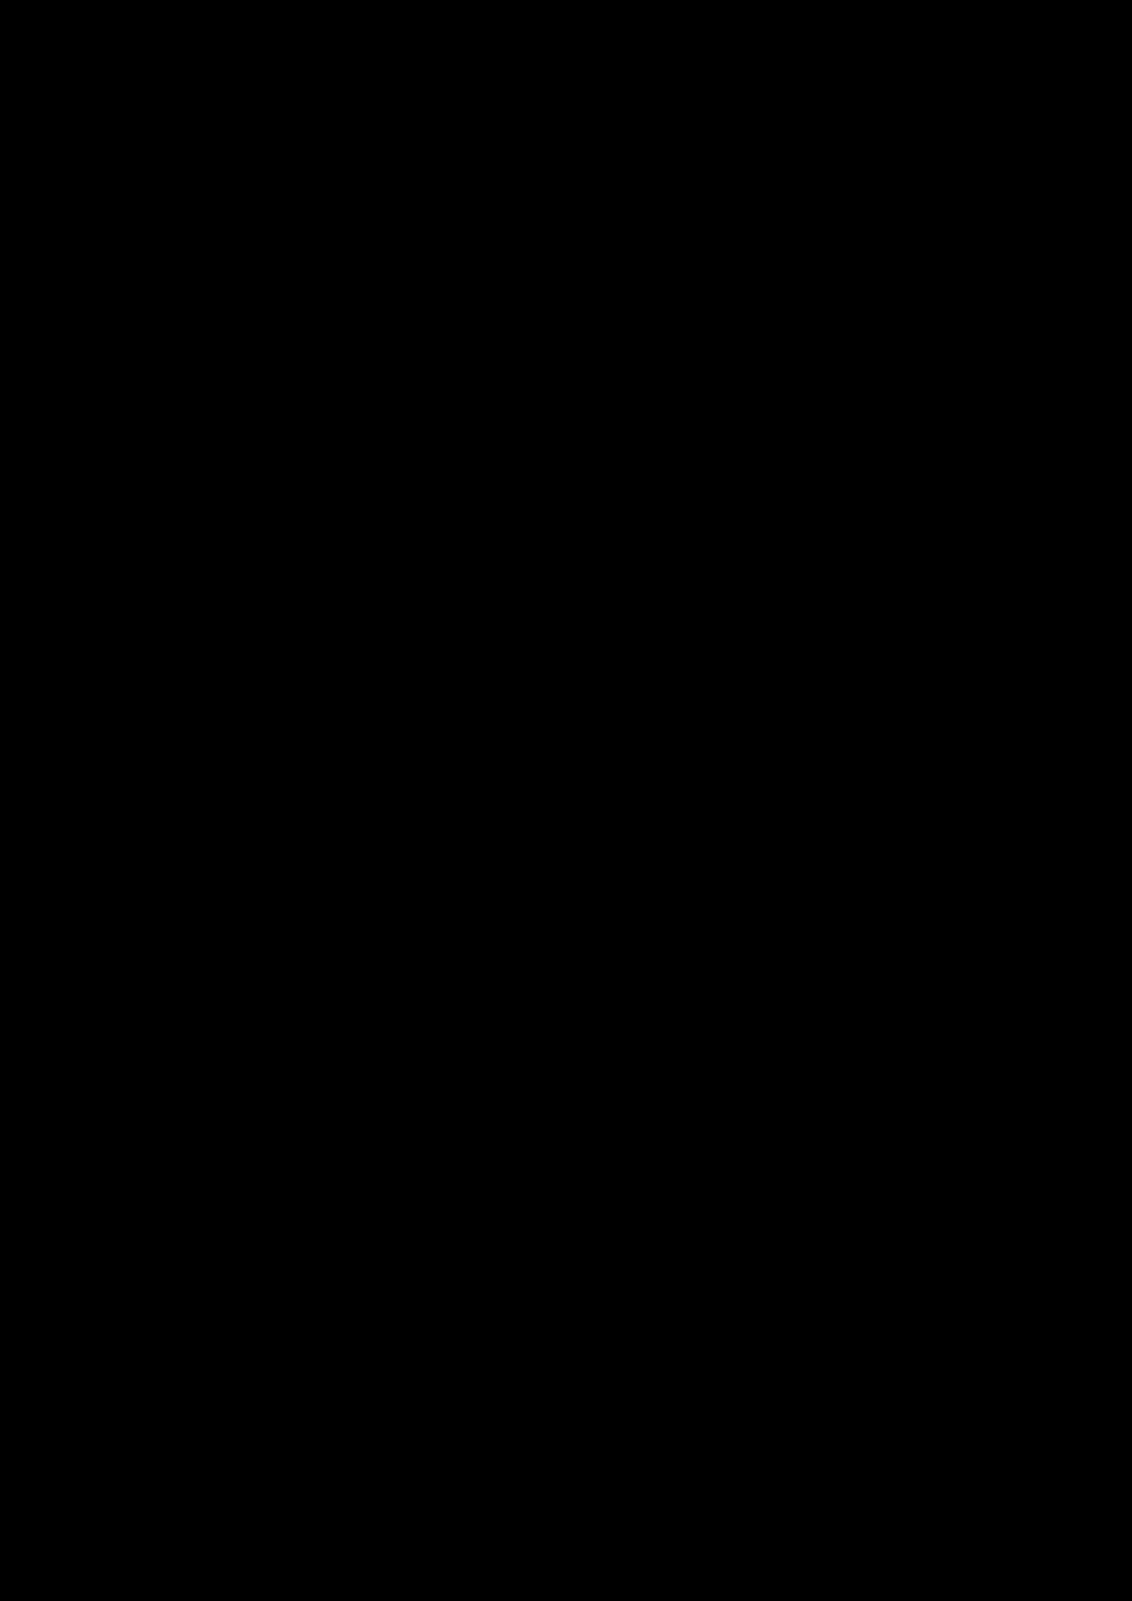 Korolevstvo slez slide, Image 81